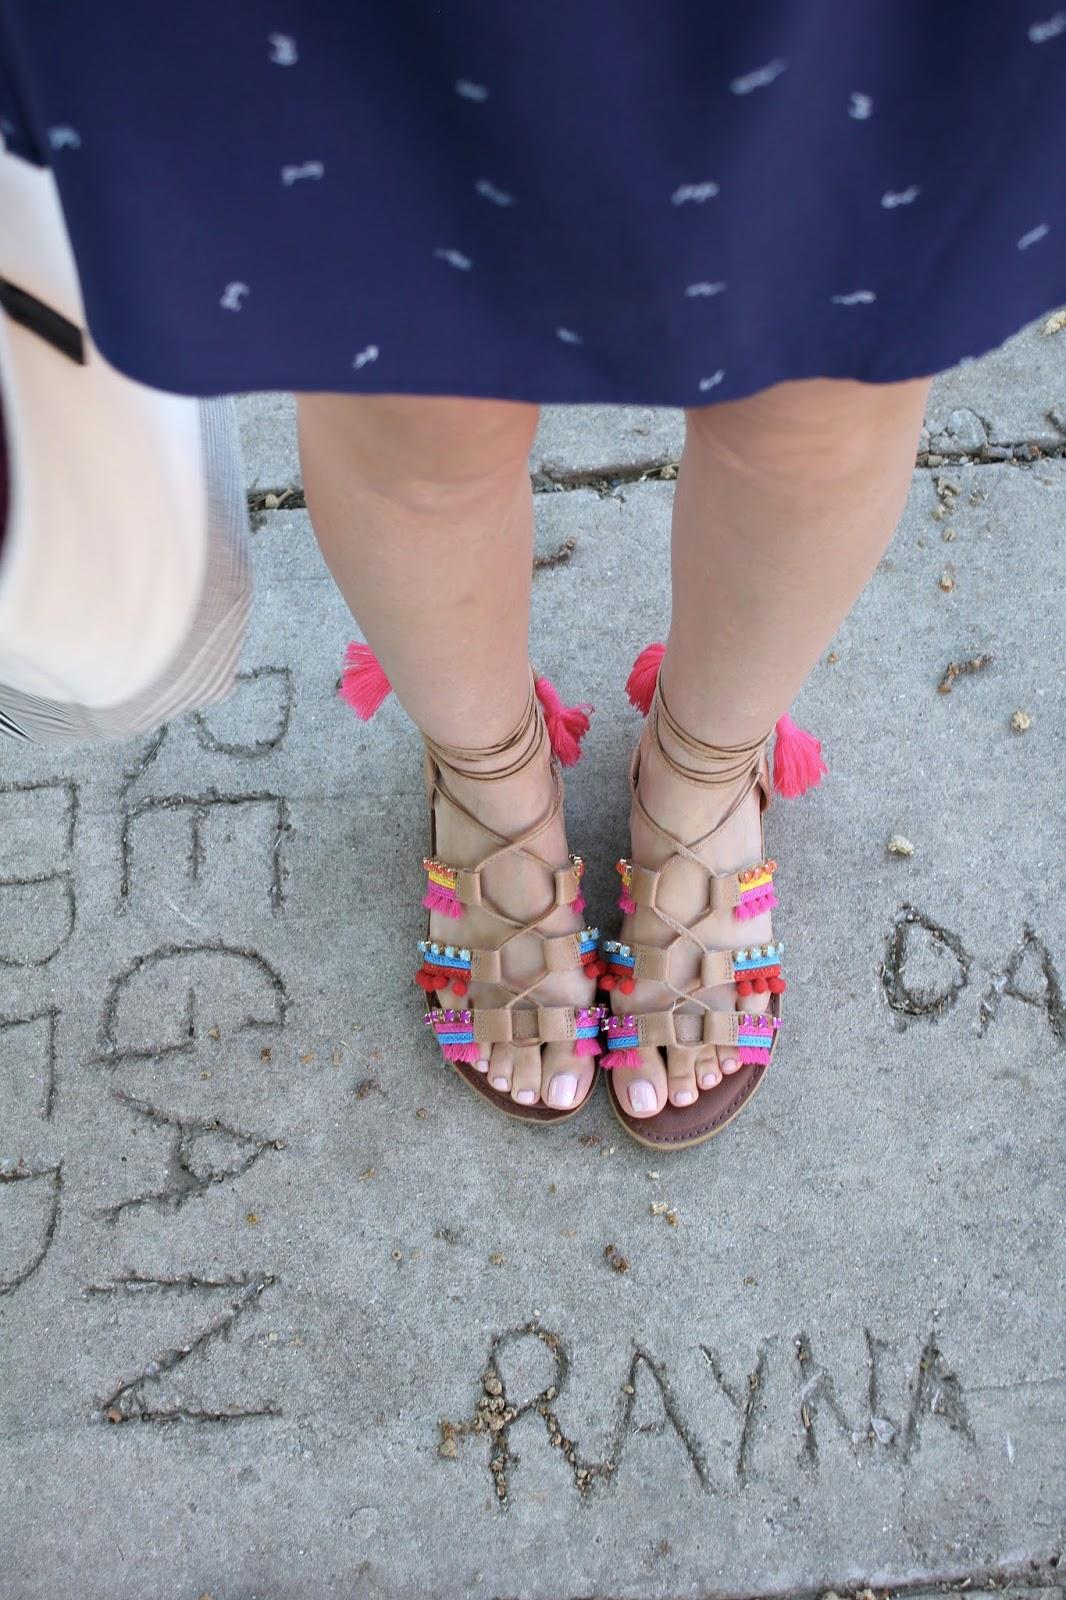 Neon Lace Up Sandals